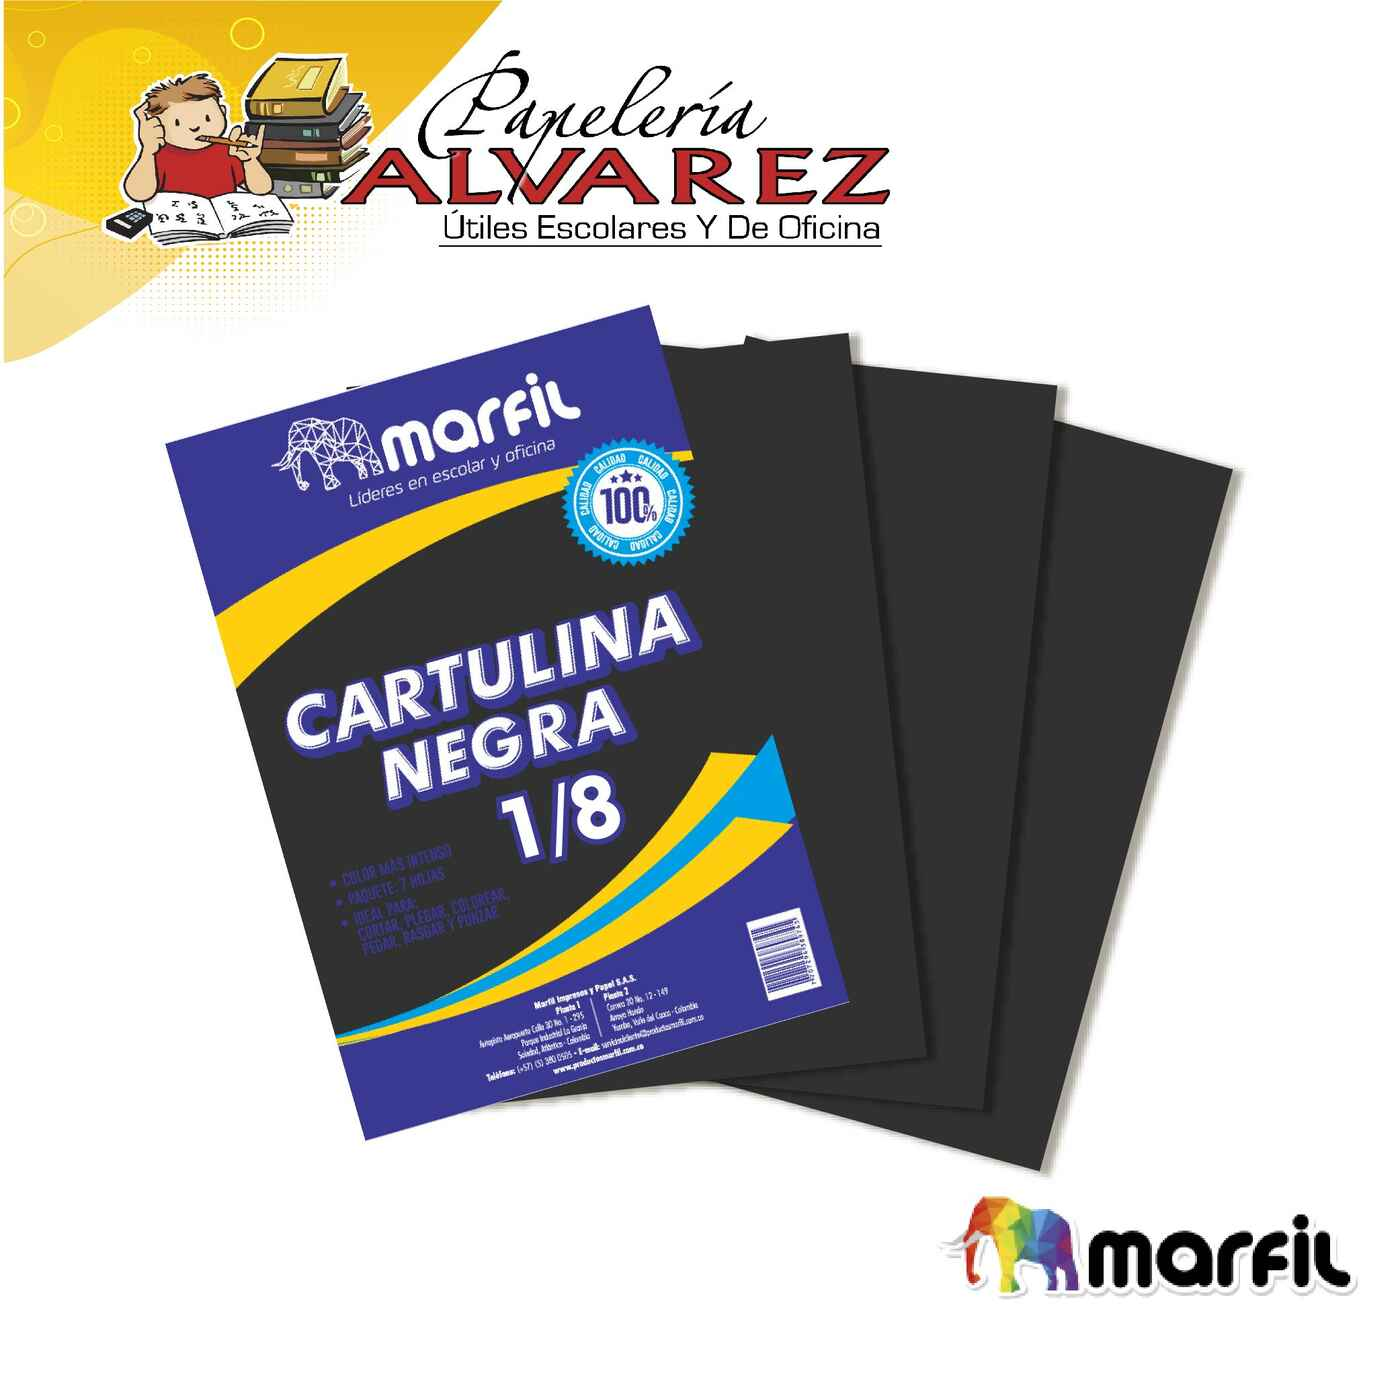 CARTULINA NEGRA MARFIL 1/8 X 7